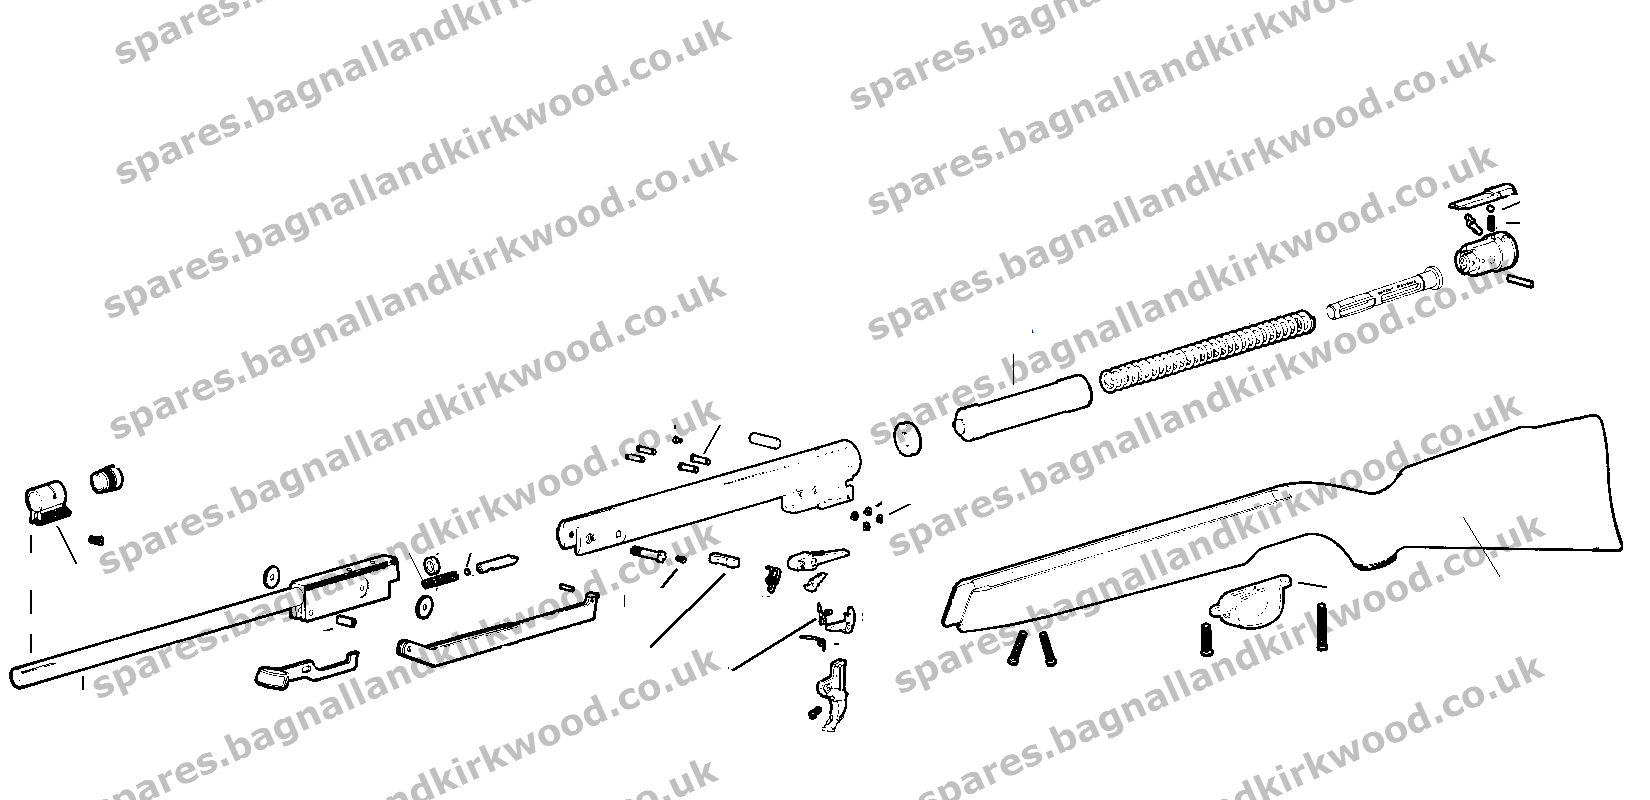 webley omega air rifle exploded parts diagram